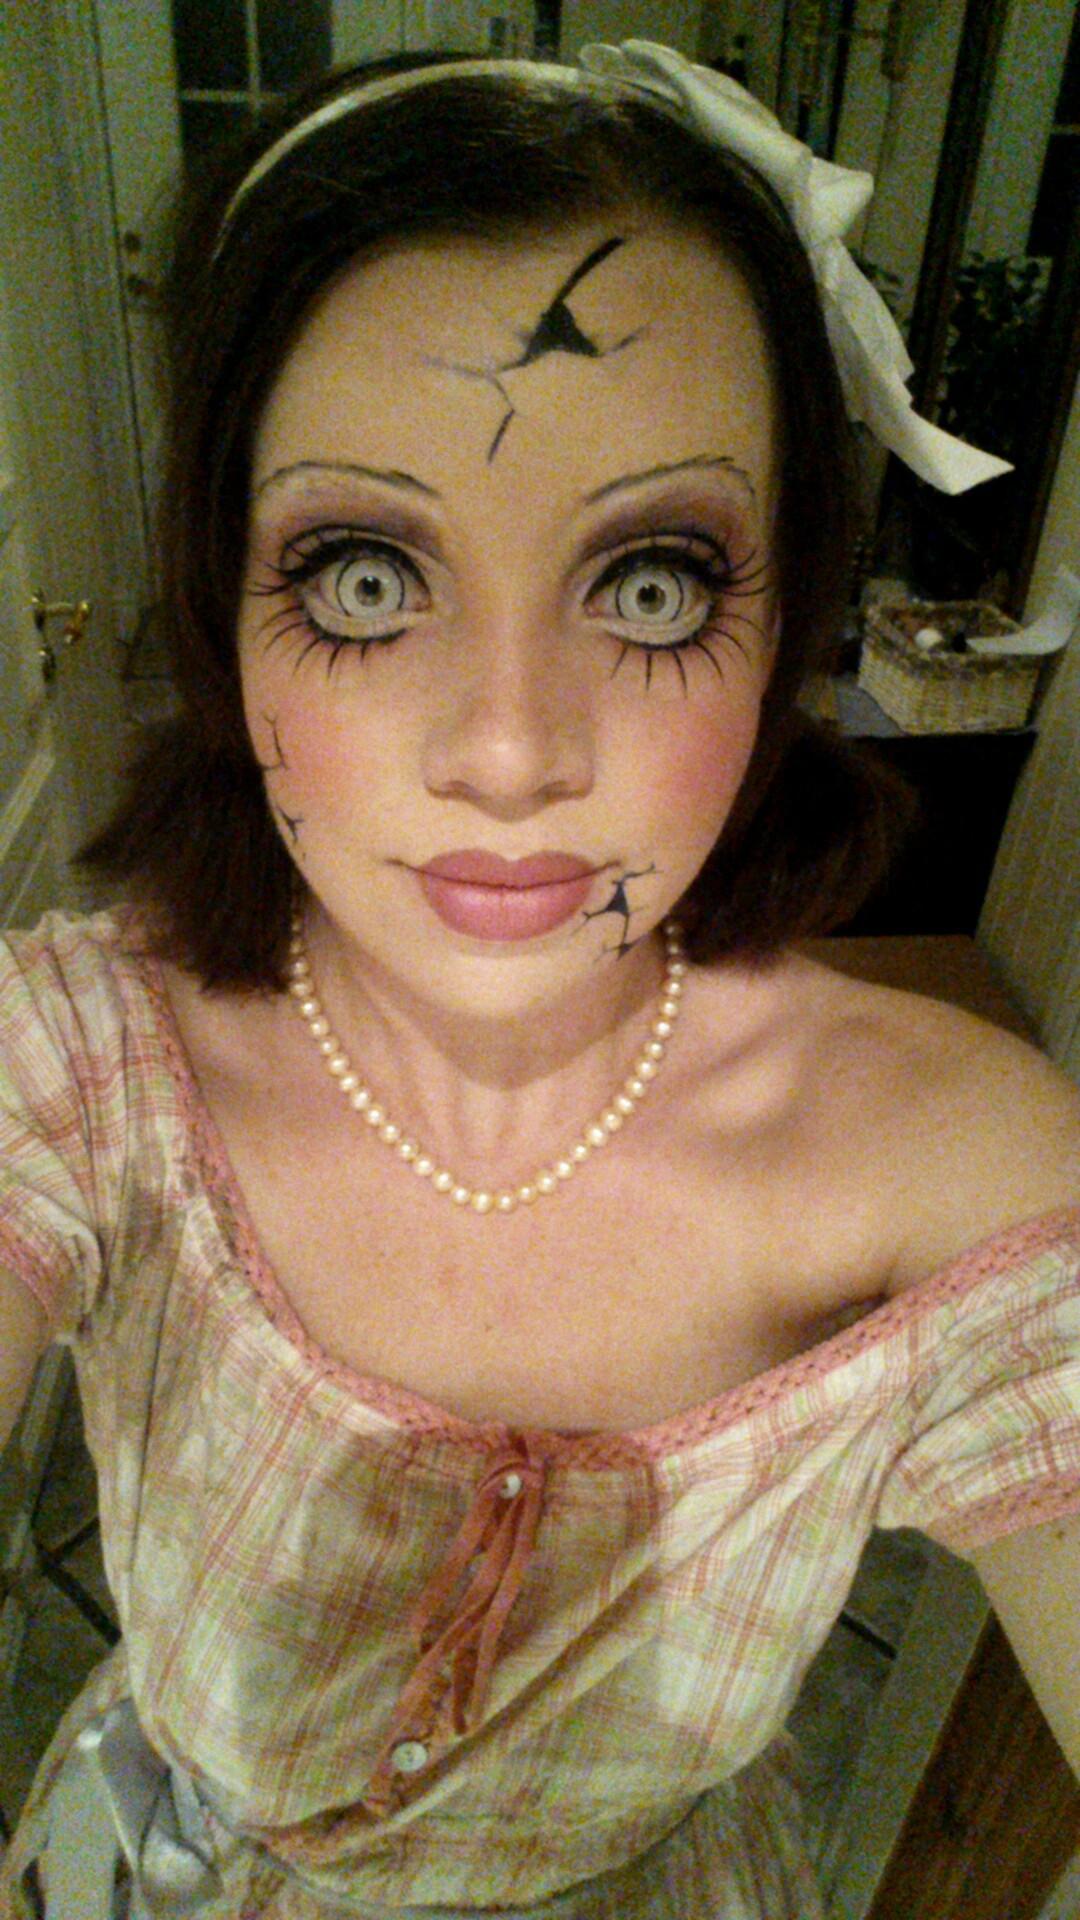 espectaculares maquillajes haloween 8